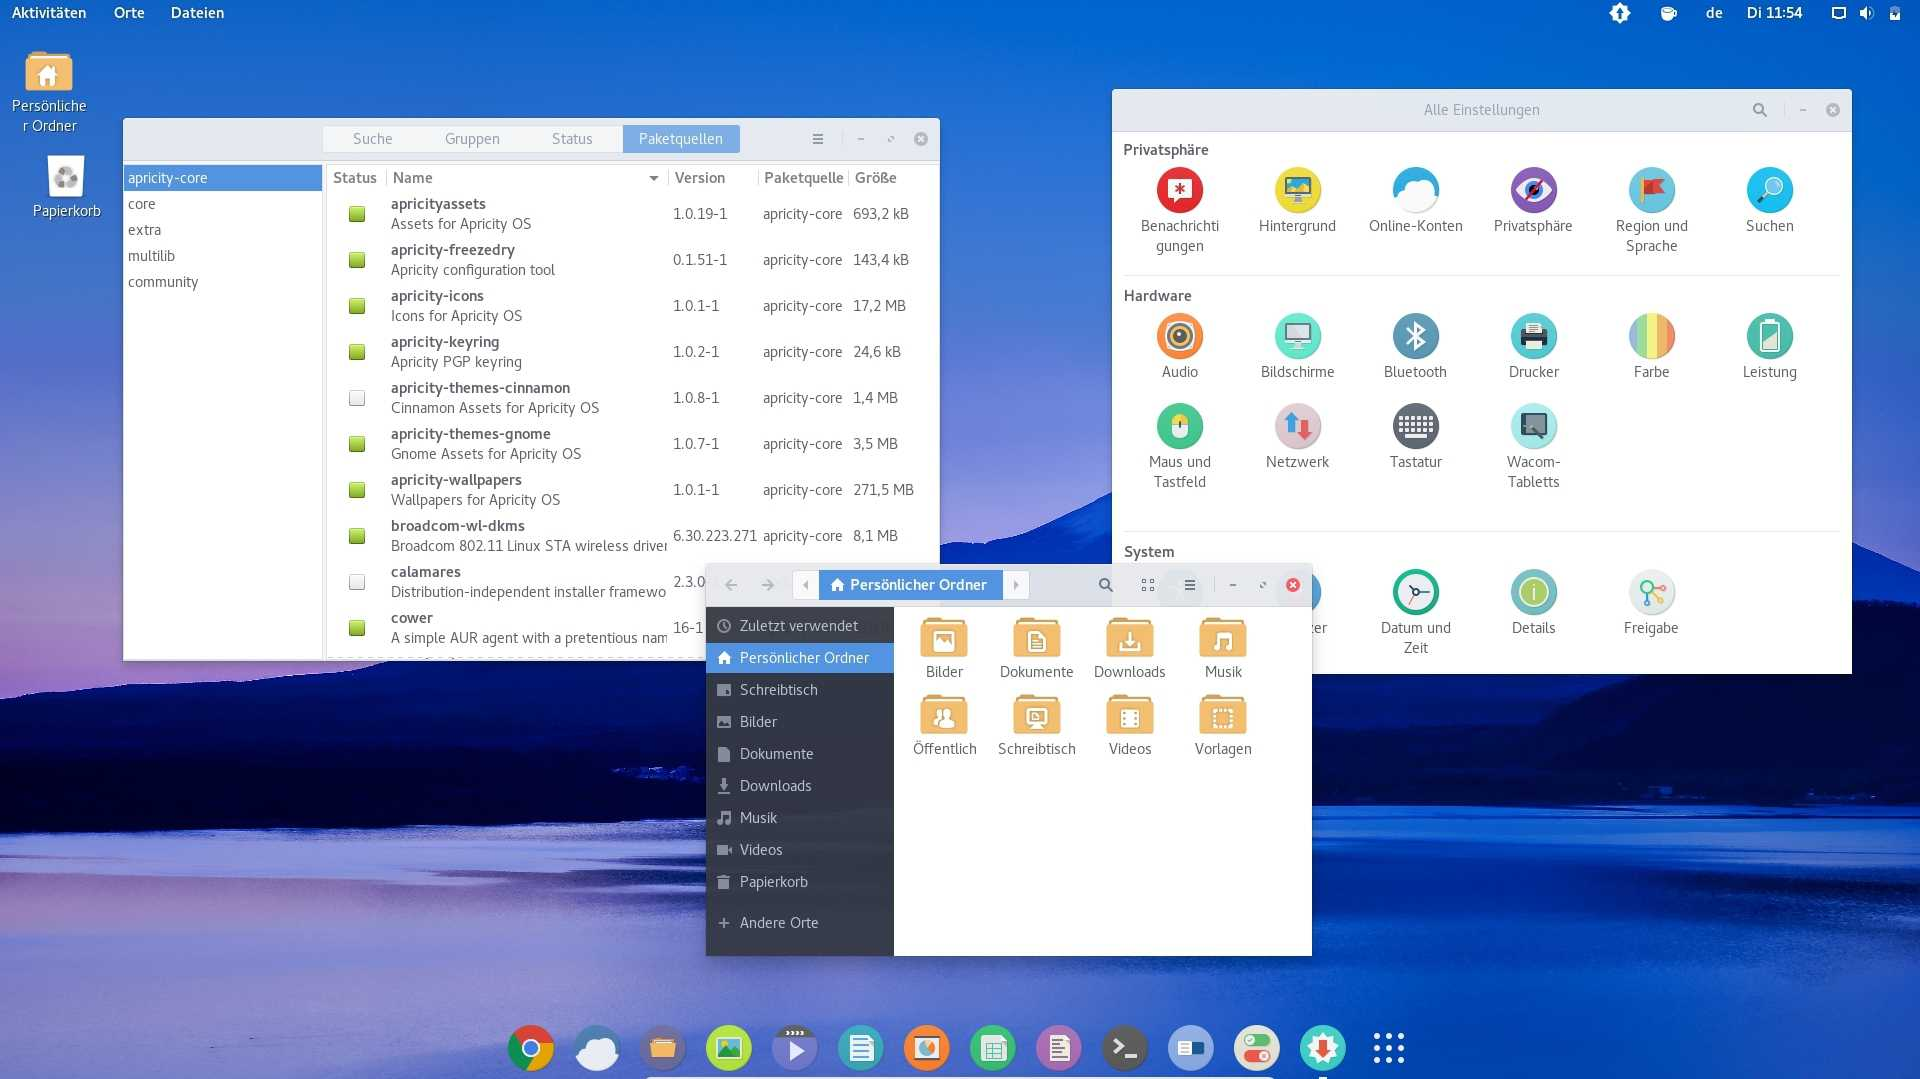 Apricity OS 07.2016